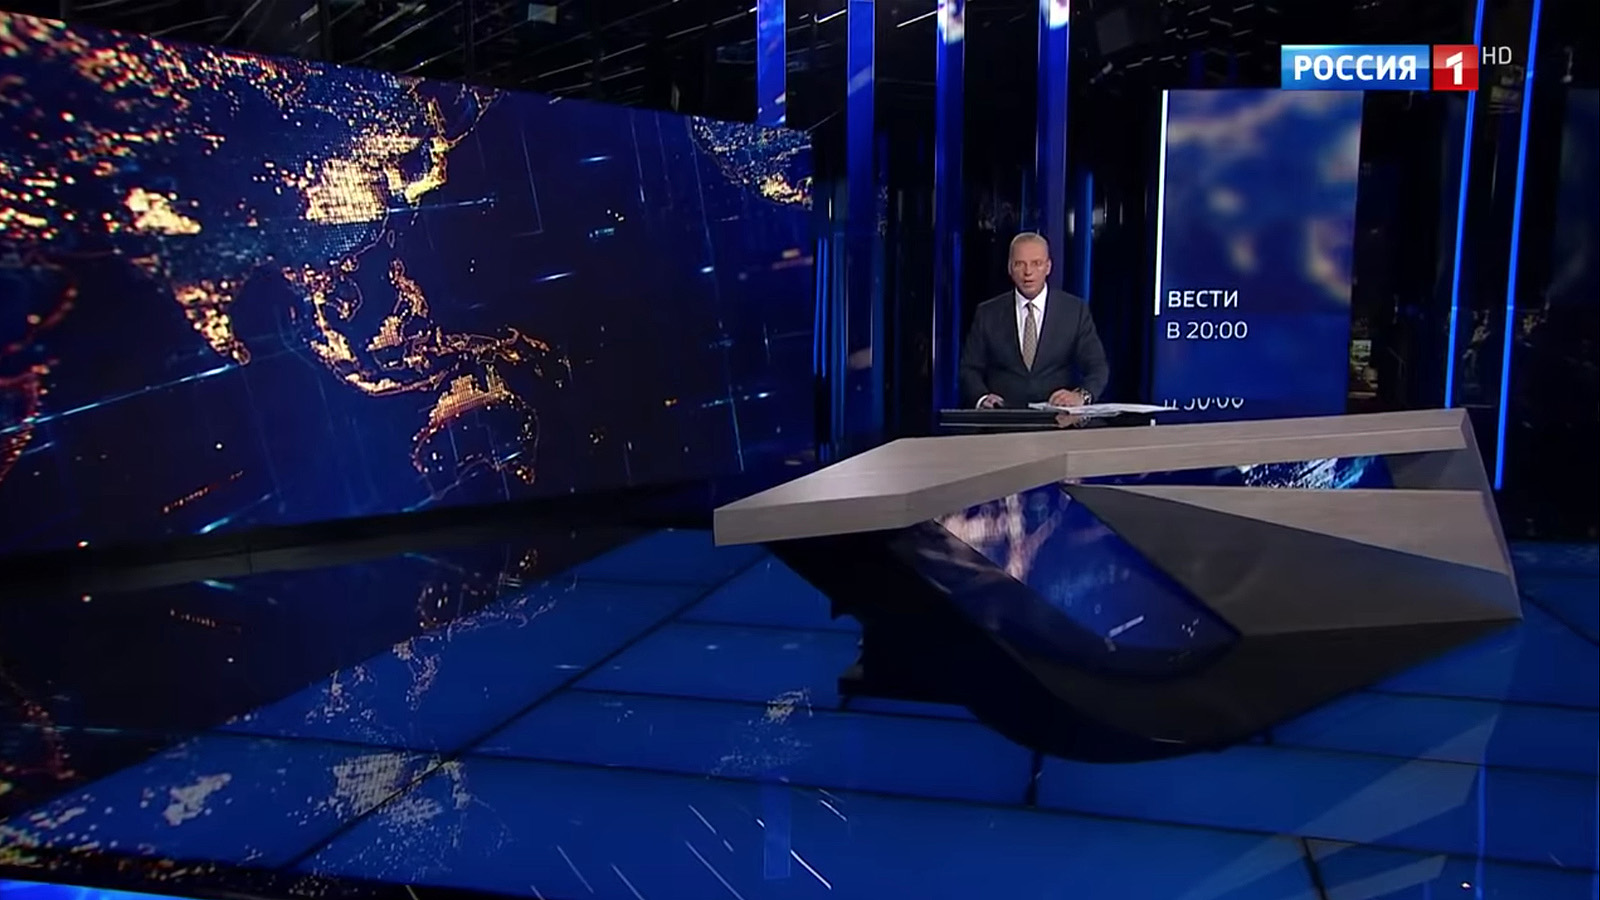 NCS_Russia-1-Vesti-Studio_0008